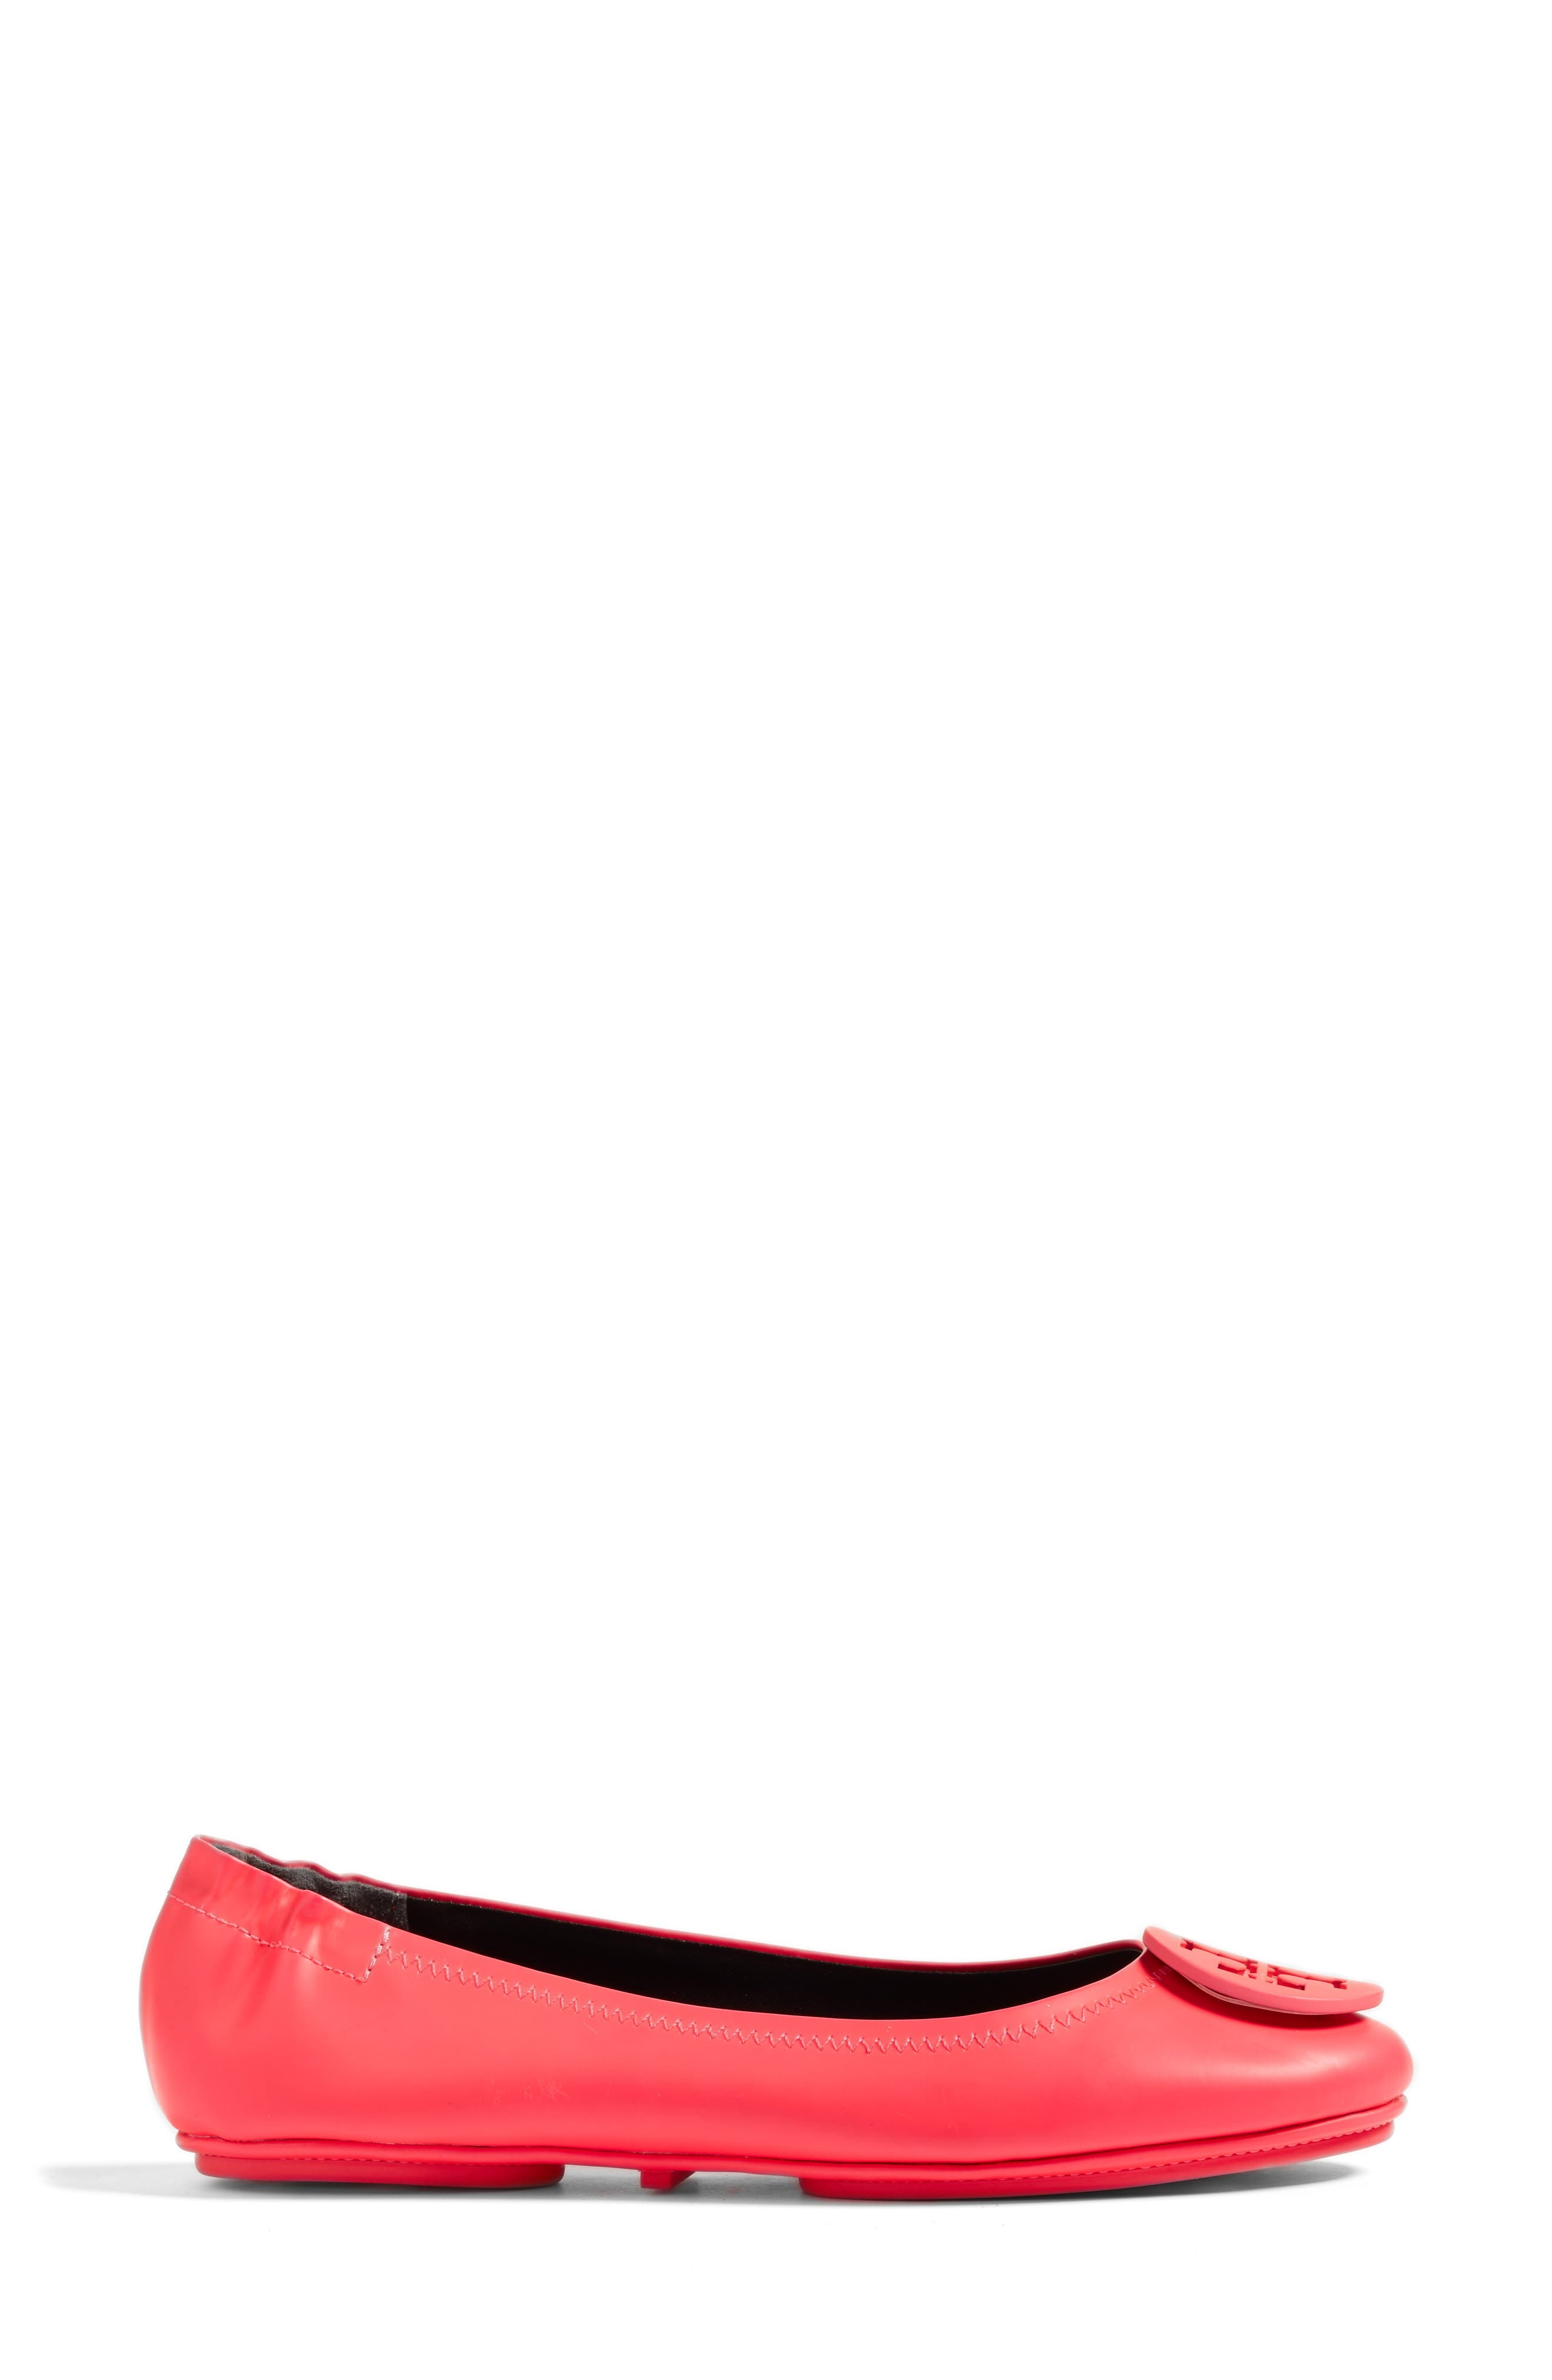 'Minnie' Travel Ballet Flat,                             Alternate thumbnail 201, color,